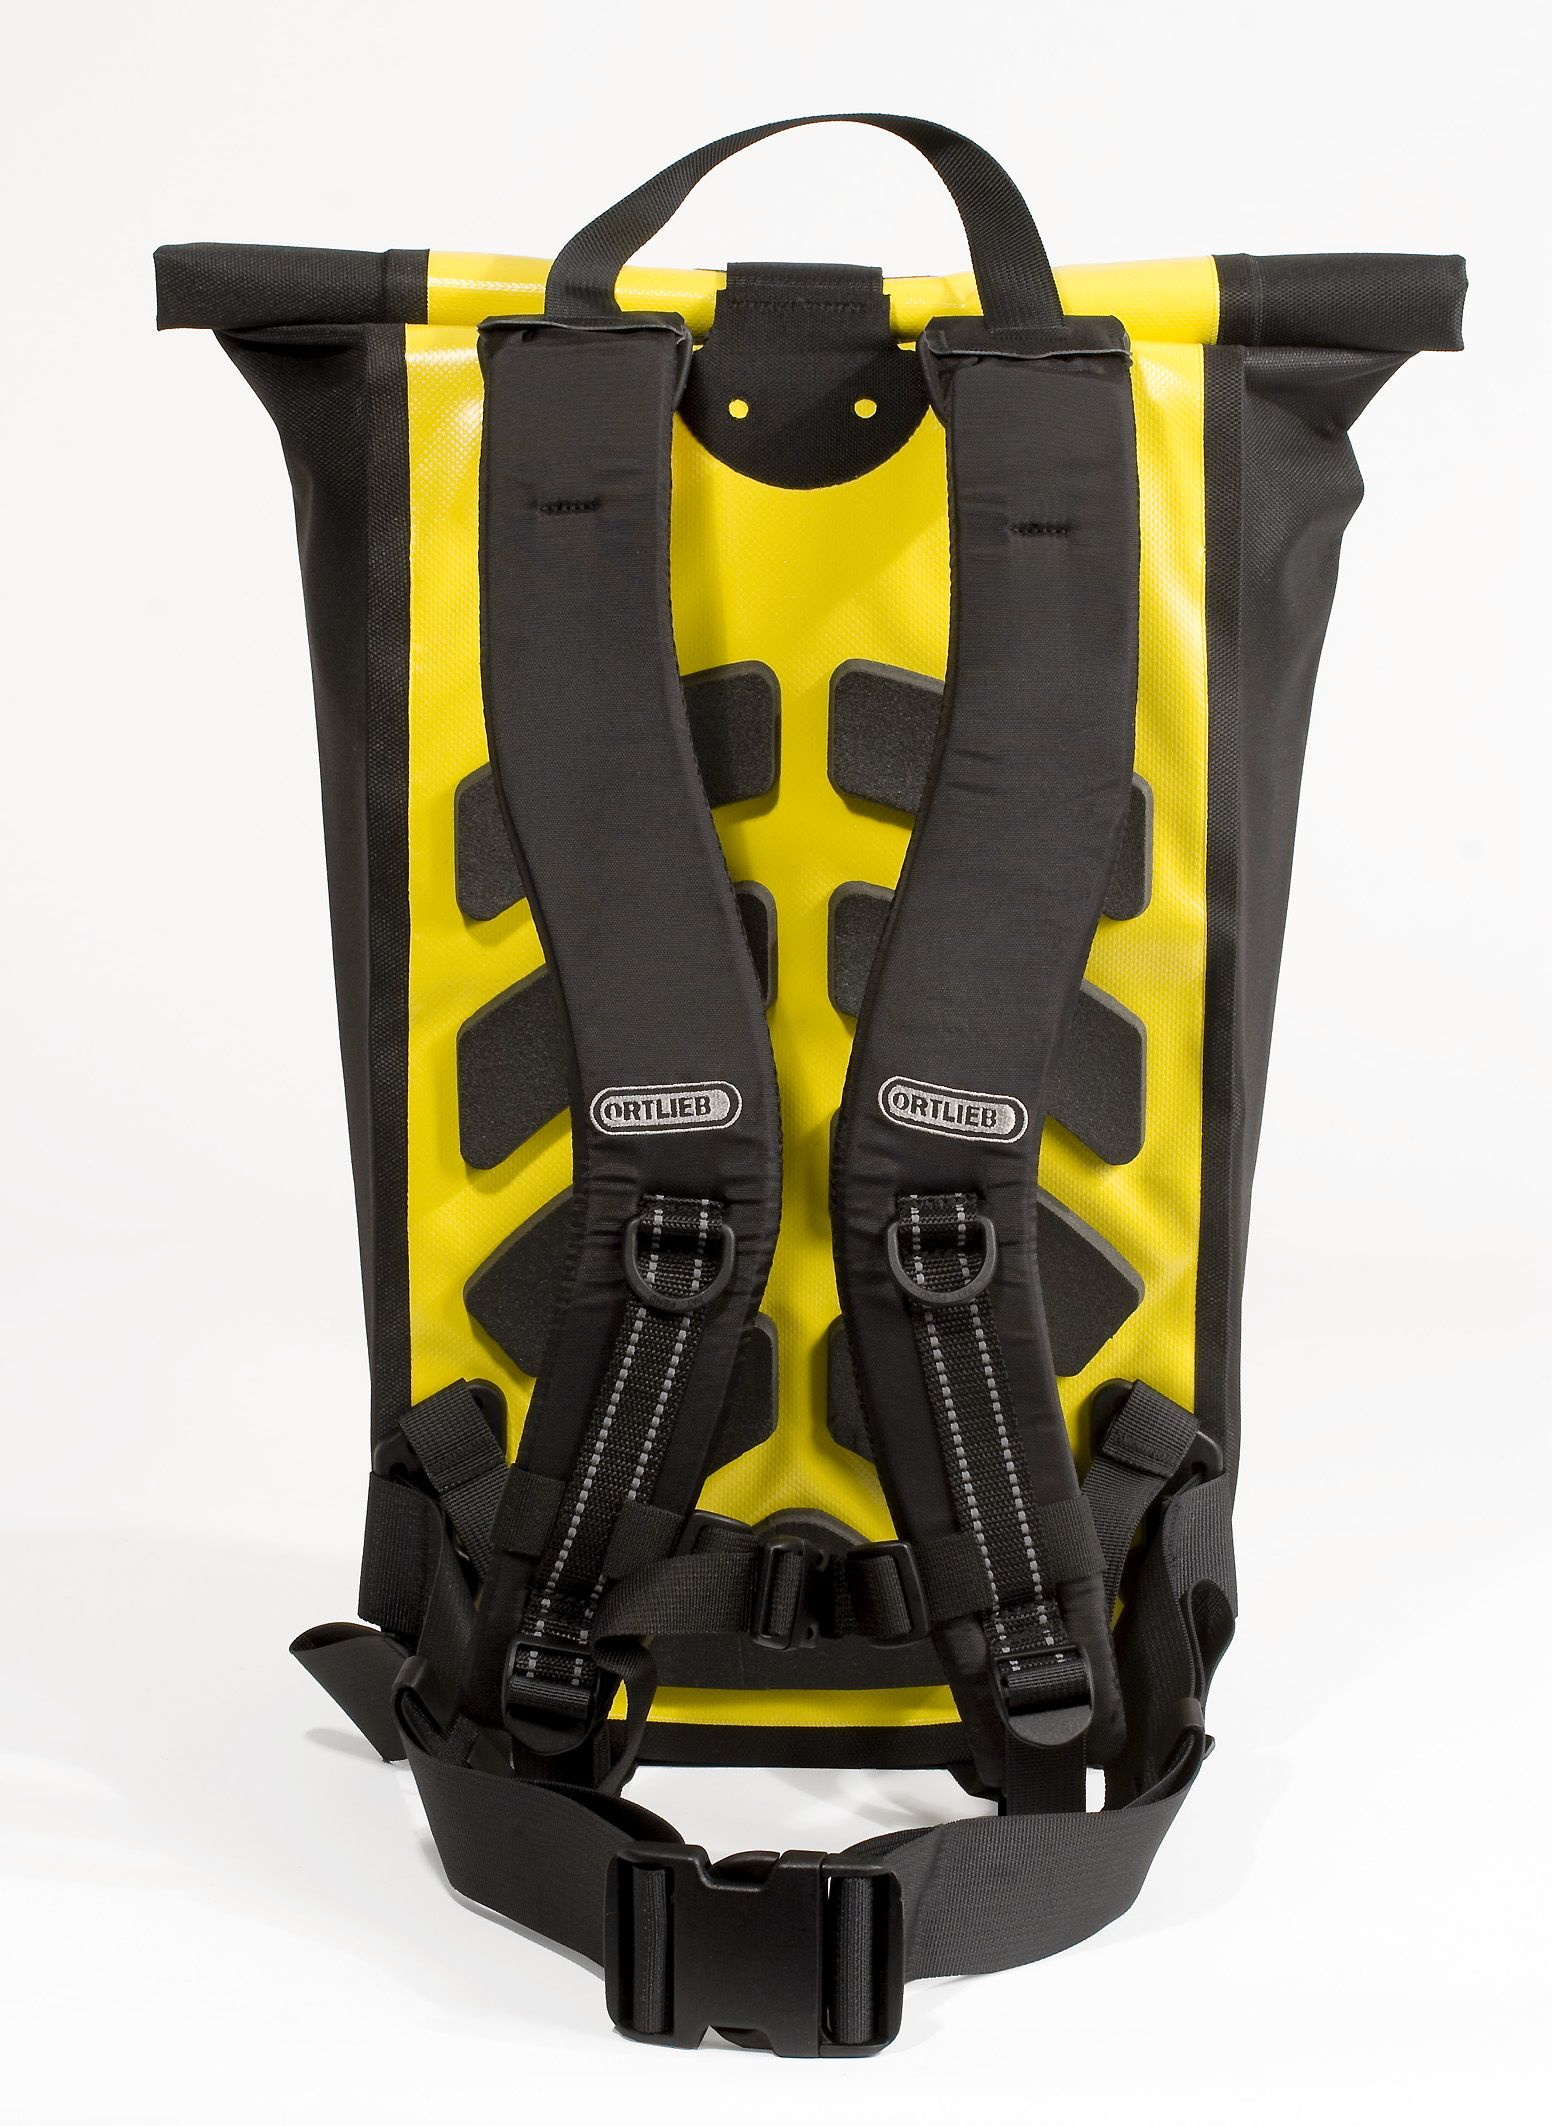 sac dos tanche ortlieb pour le v lo et le vtt bagpack pinterest le v lo vtt et sac. Black Bedroom Furniture Sets. Home Design Ideas